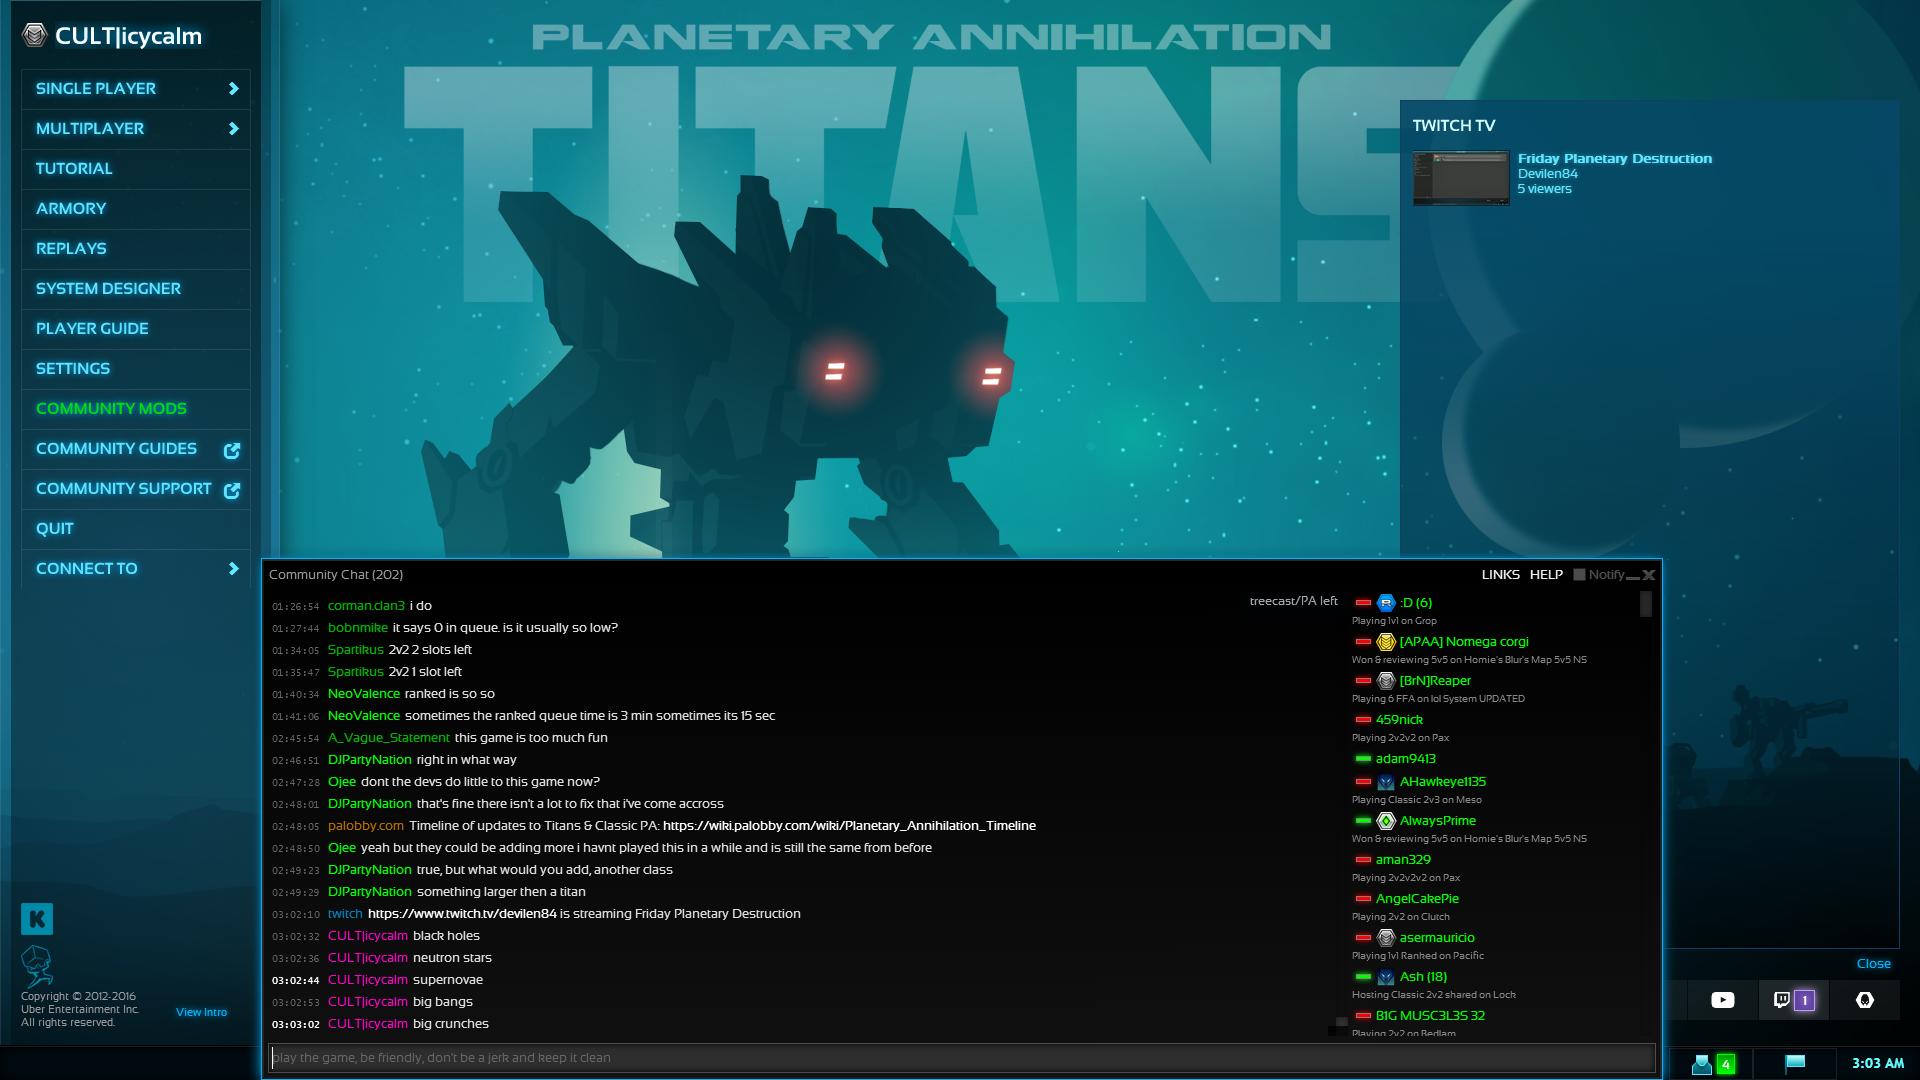 Screenshot (149).png